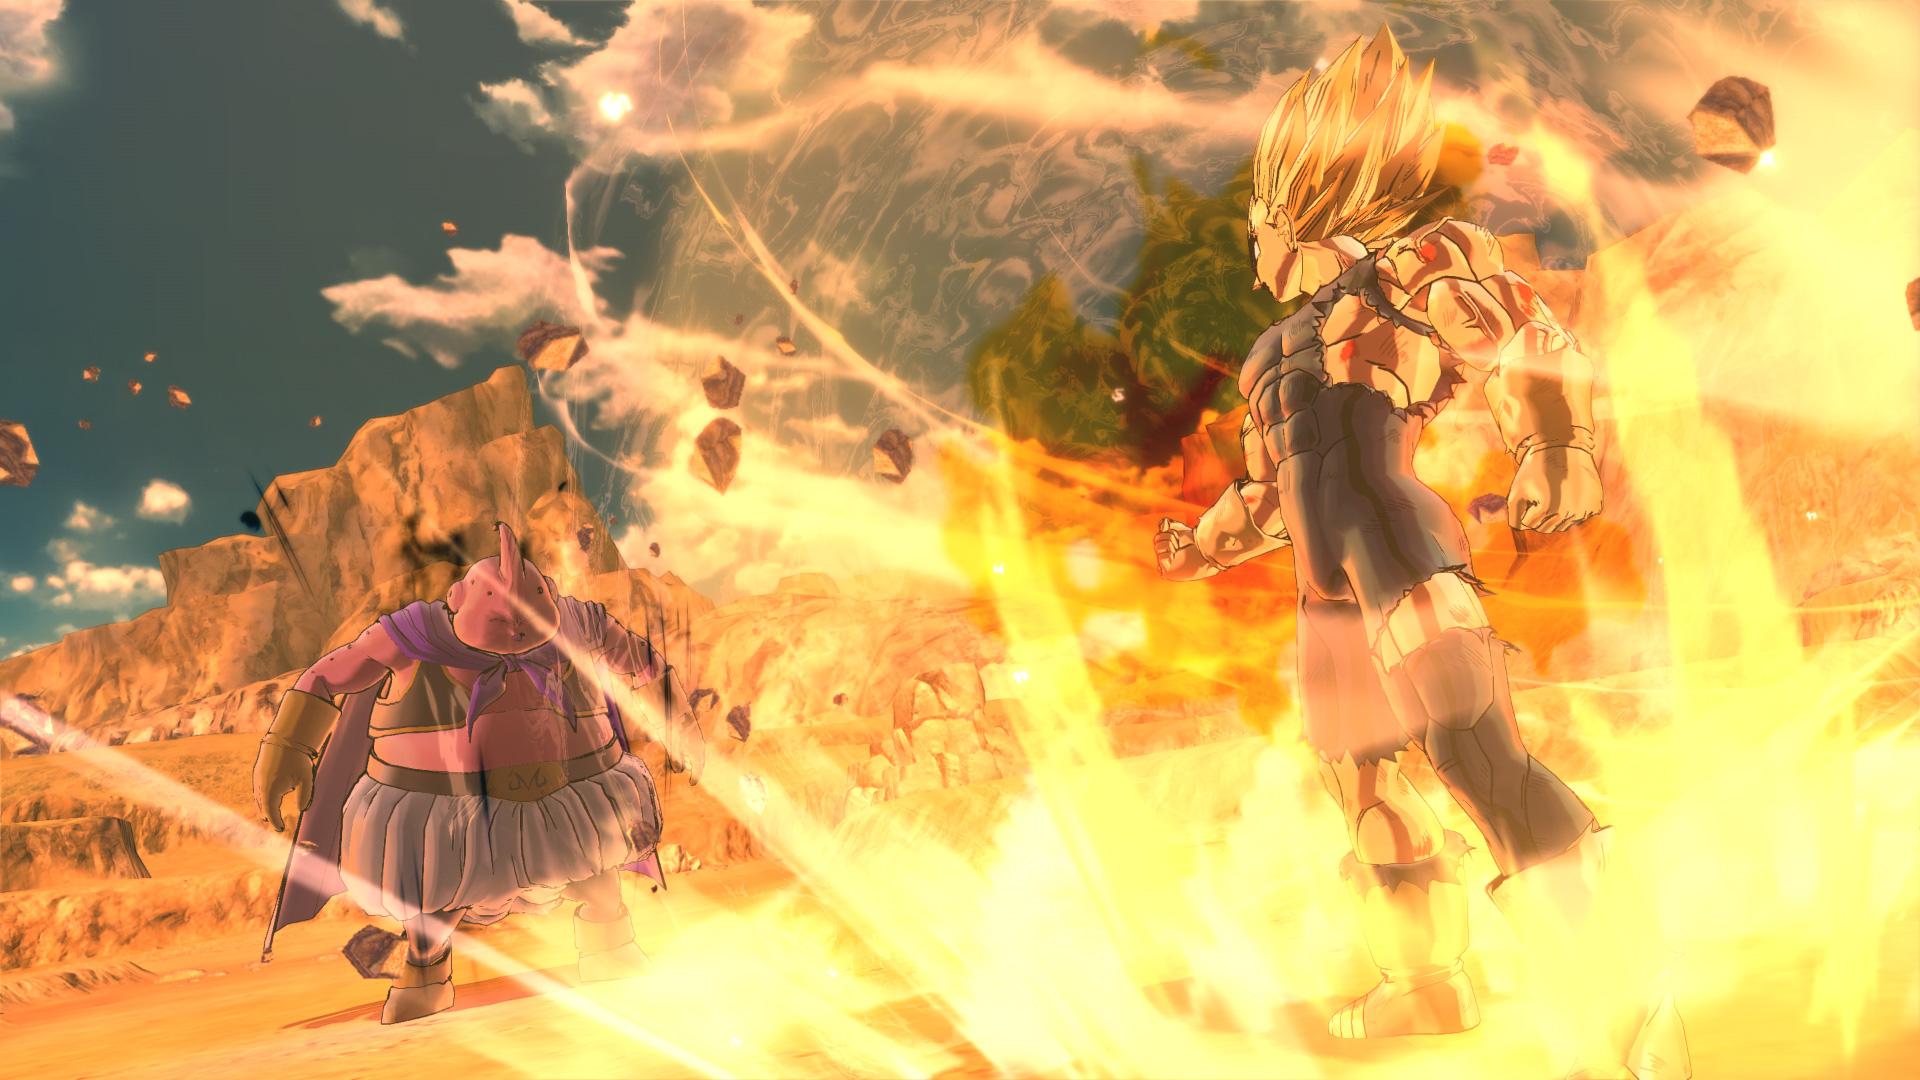 DRAGON BALL XENOVERSE 2 - Anime Music Pack 2 on Steam